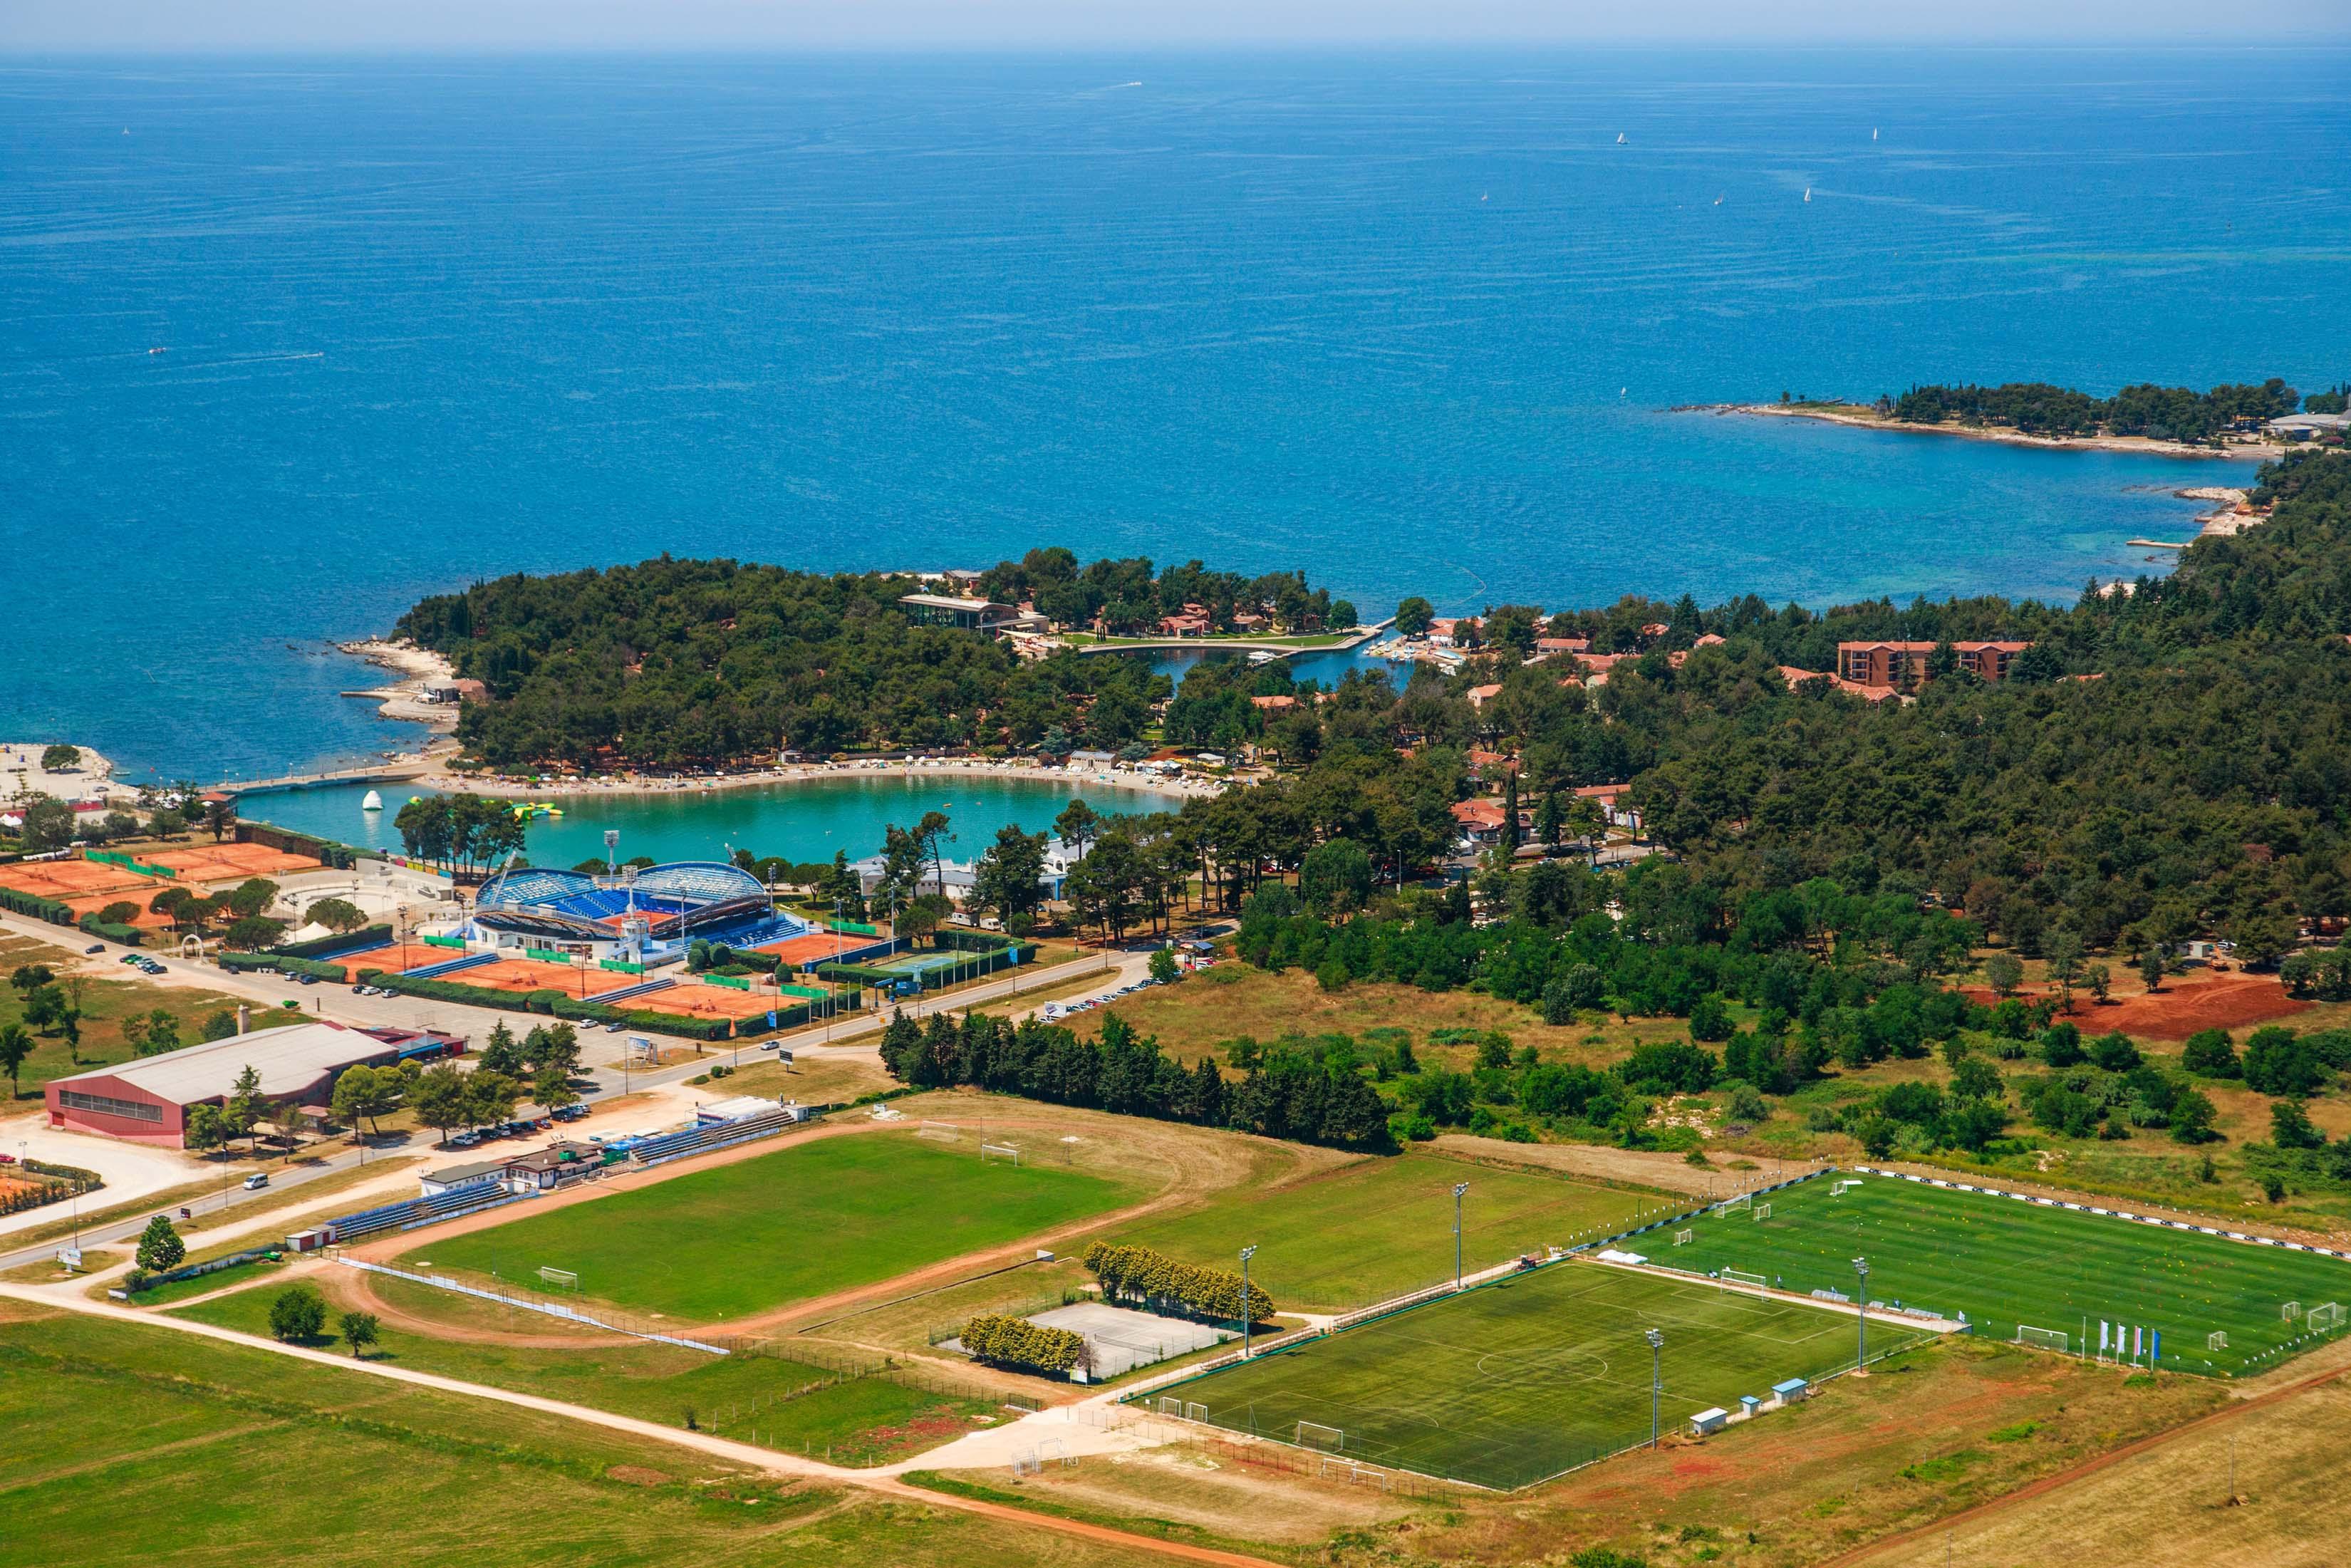 https://cms.satur.sk/data/imgs/tour_image/orig/stella-maris-resort-avio-panorama_2-1800586.jpg